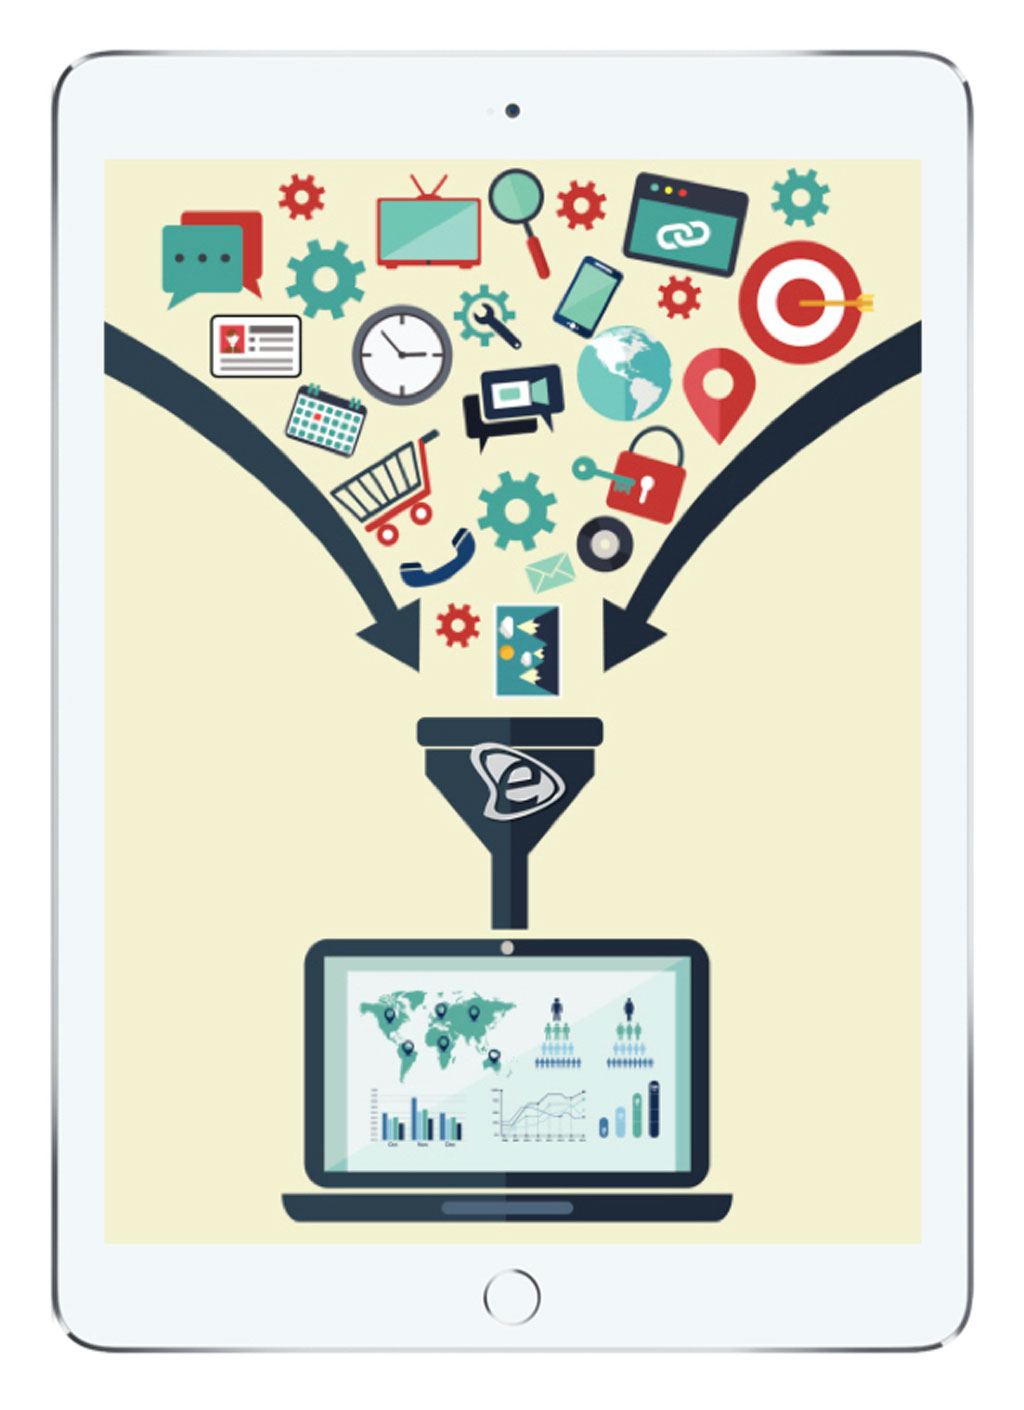 SEO - E-Marketing Clusters